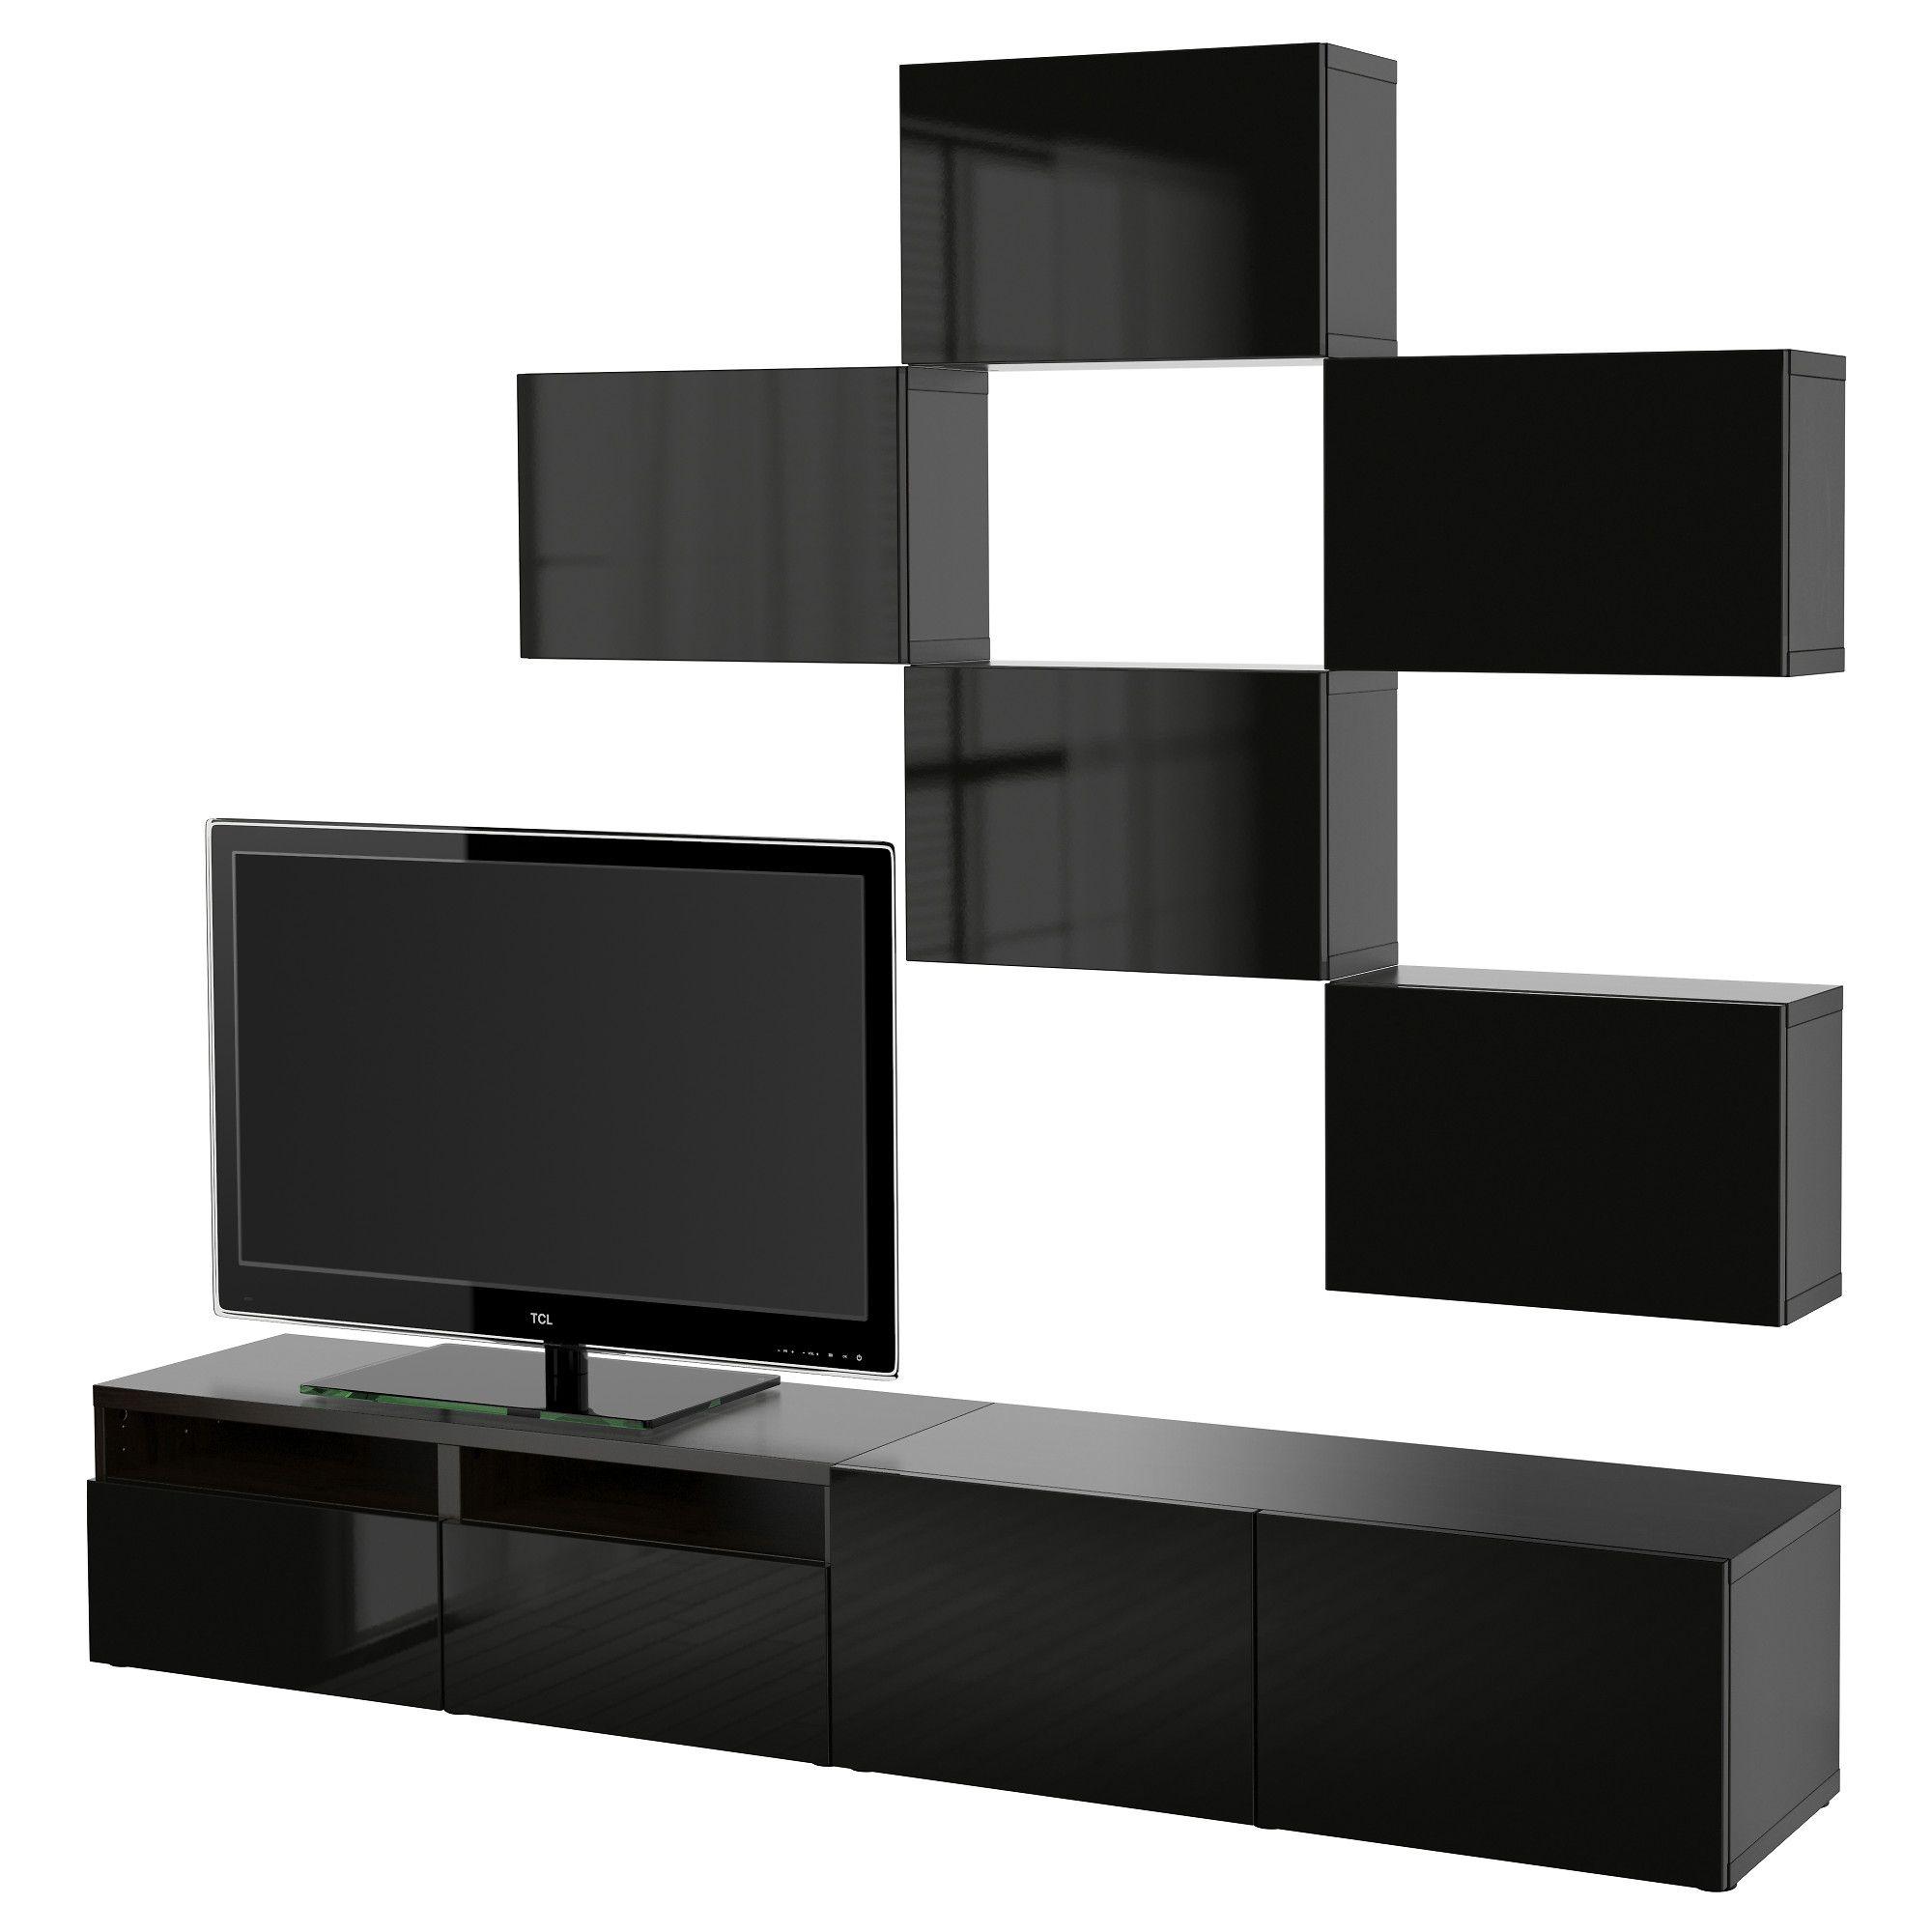 pin by ladendirekt on tv-hifi-möbel in 2018 | pinterest | hifi möbel